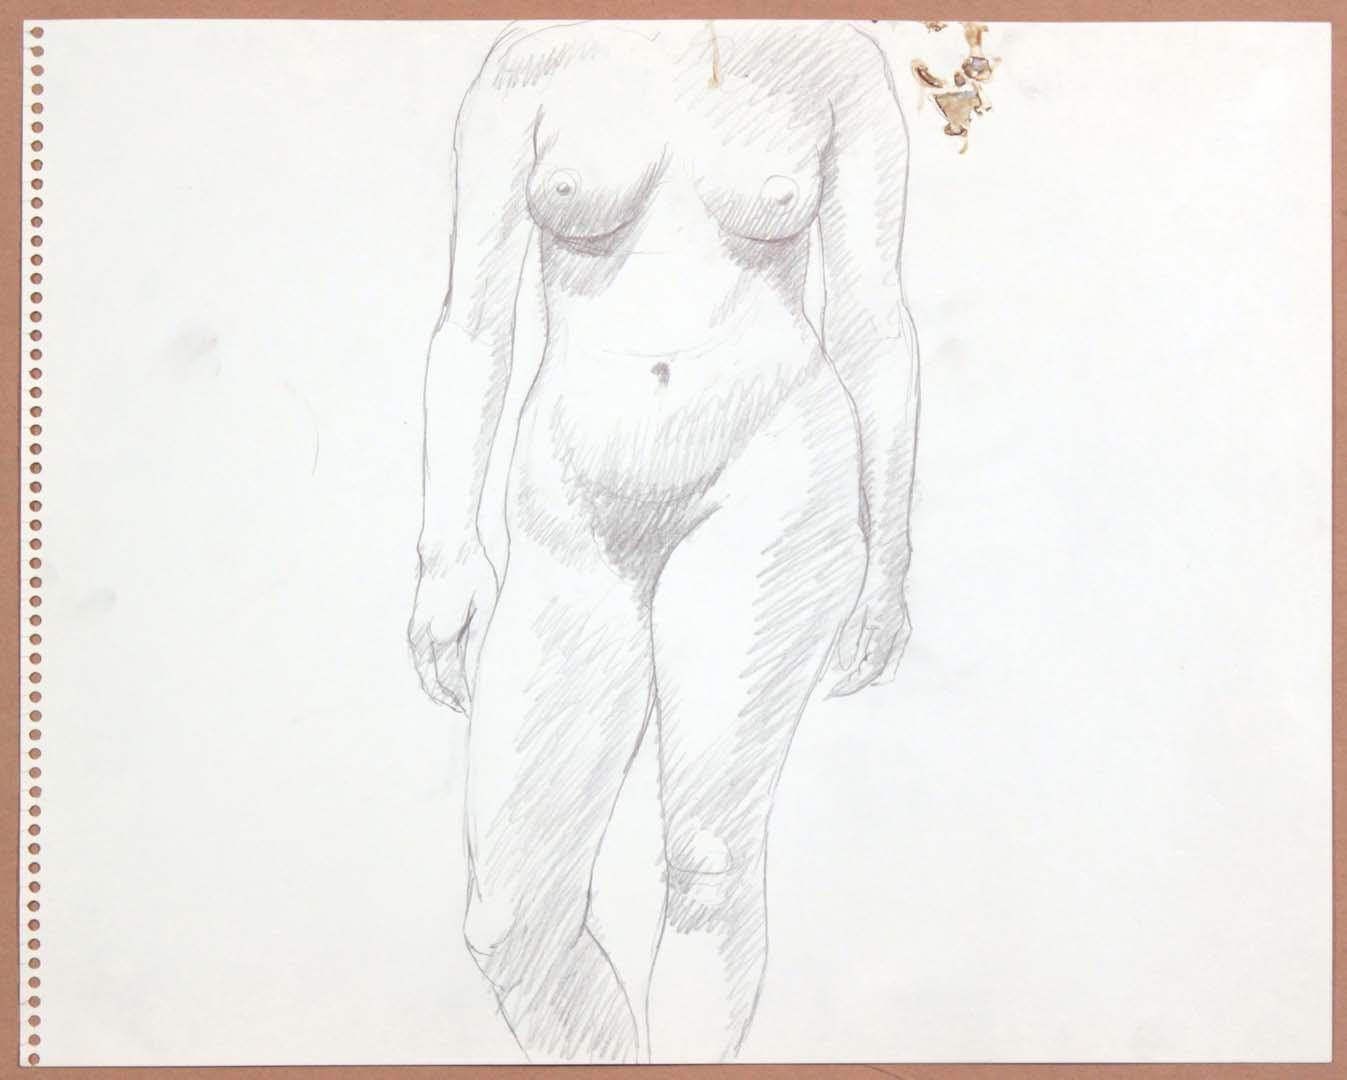 1965 Standing Female Graphite 13.75 x 17